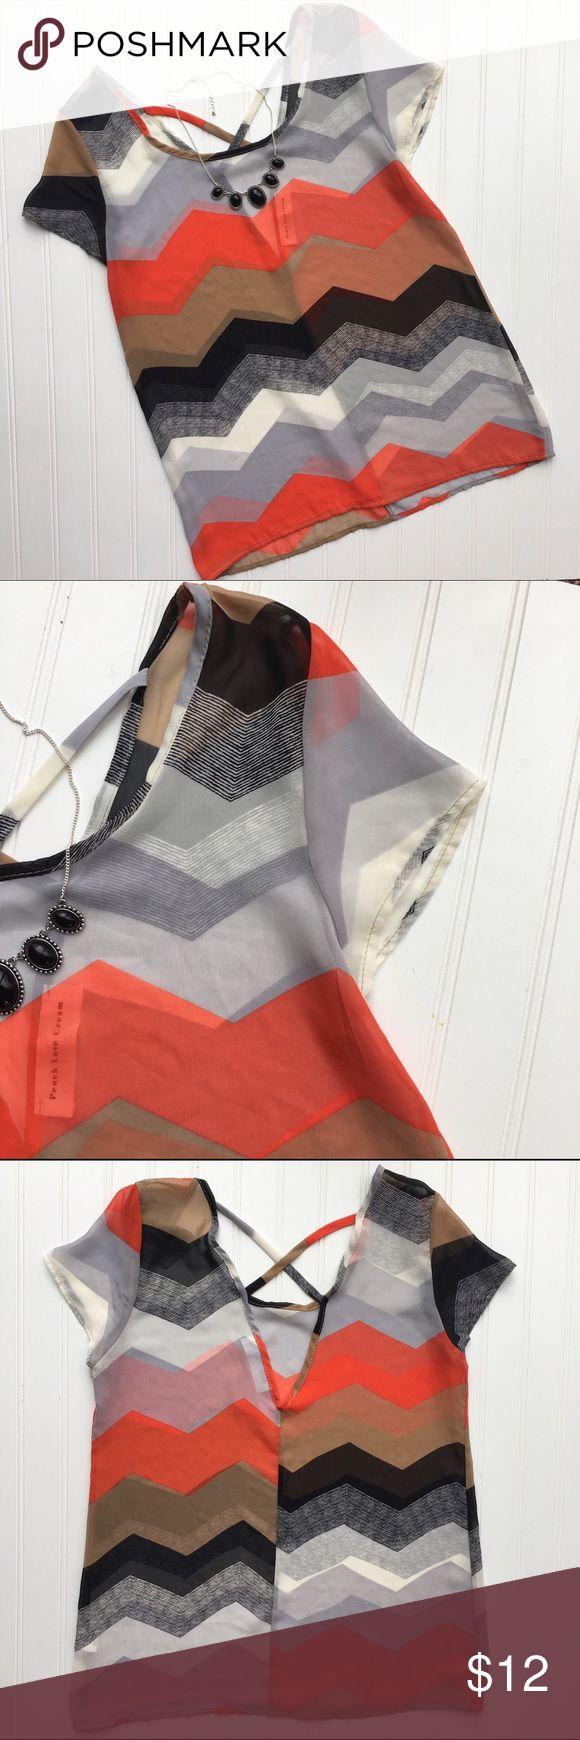 "Gorgeous sheer chevron blouse! Small Gorgeous orange, tan, black, and cream chevron print blouse! Sheer, and the back has a deep V with criss cross laces. So cute! Polyester. Peach Love Cream // Small // B 18"" L 26""// peach love cream Tops"